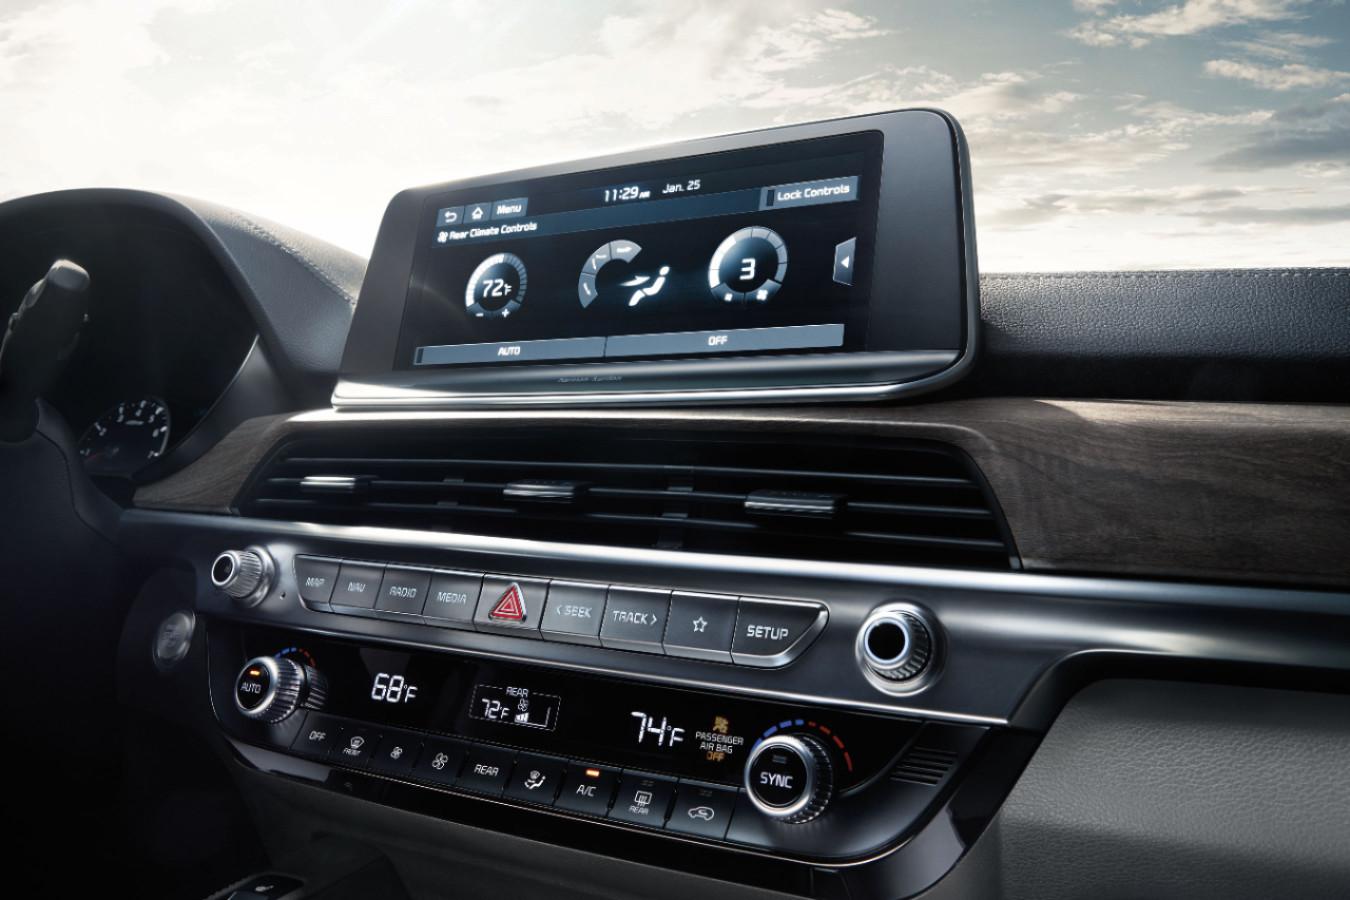 2020 Kia Telluride Dashboard